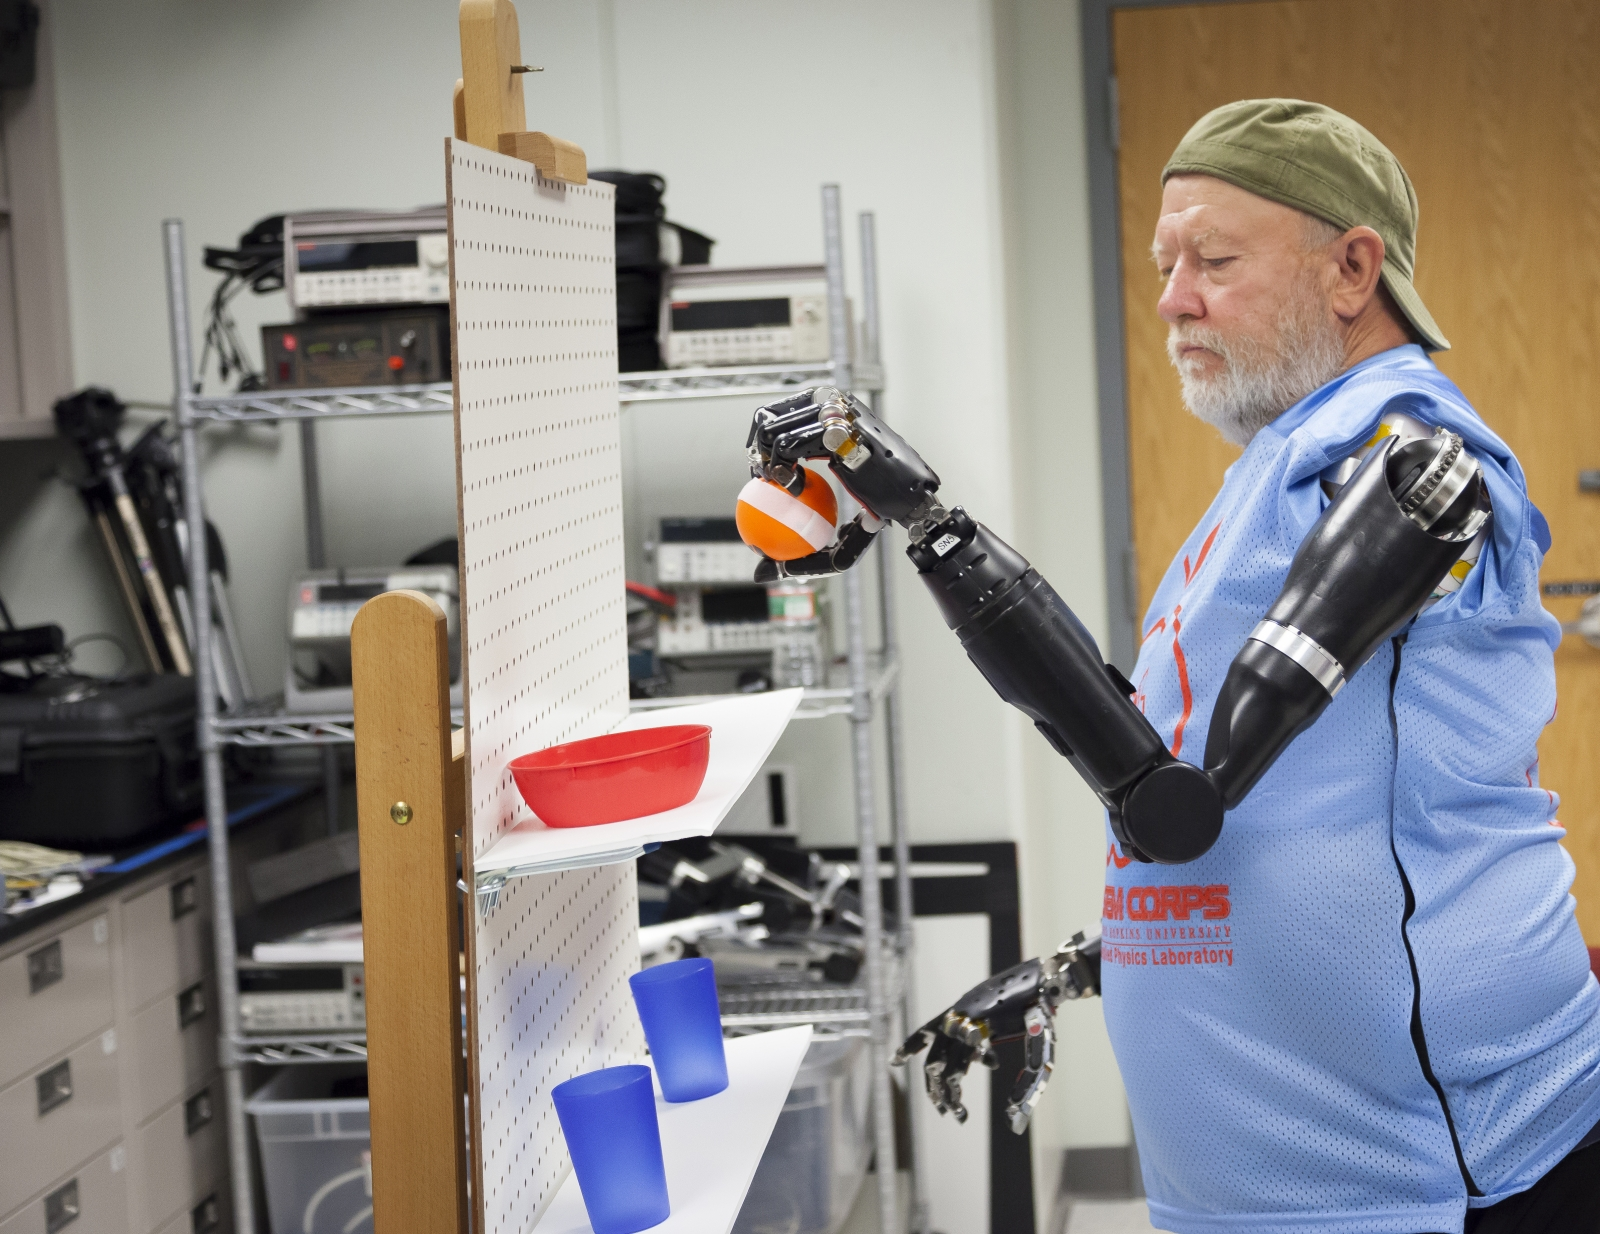 mind controlled prosthetics